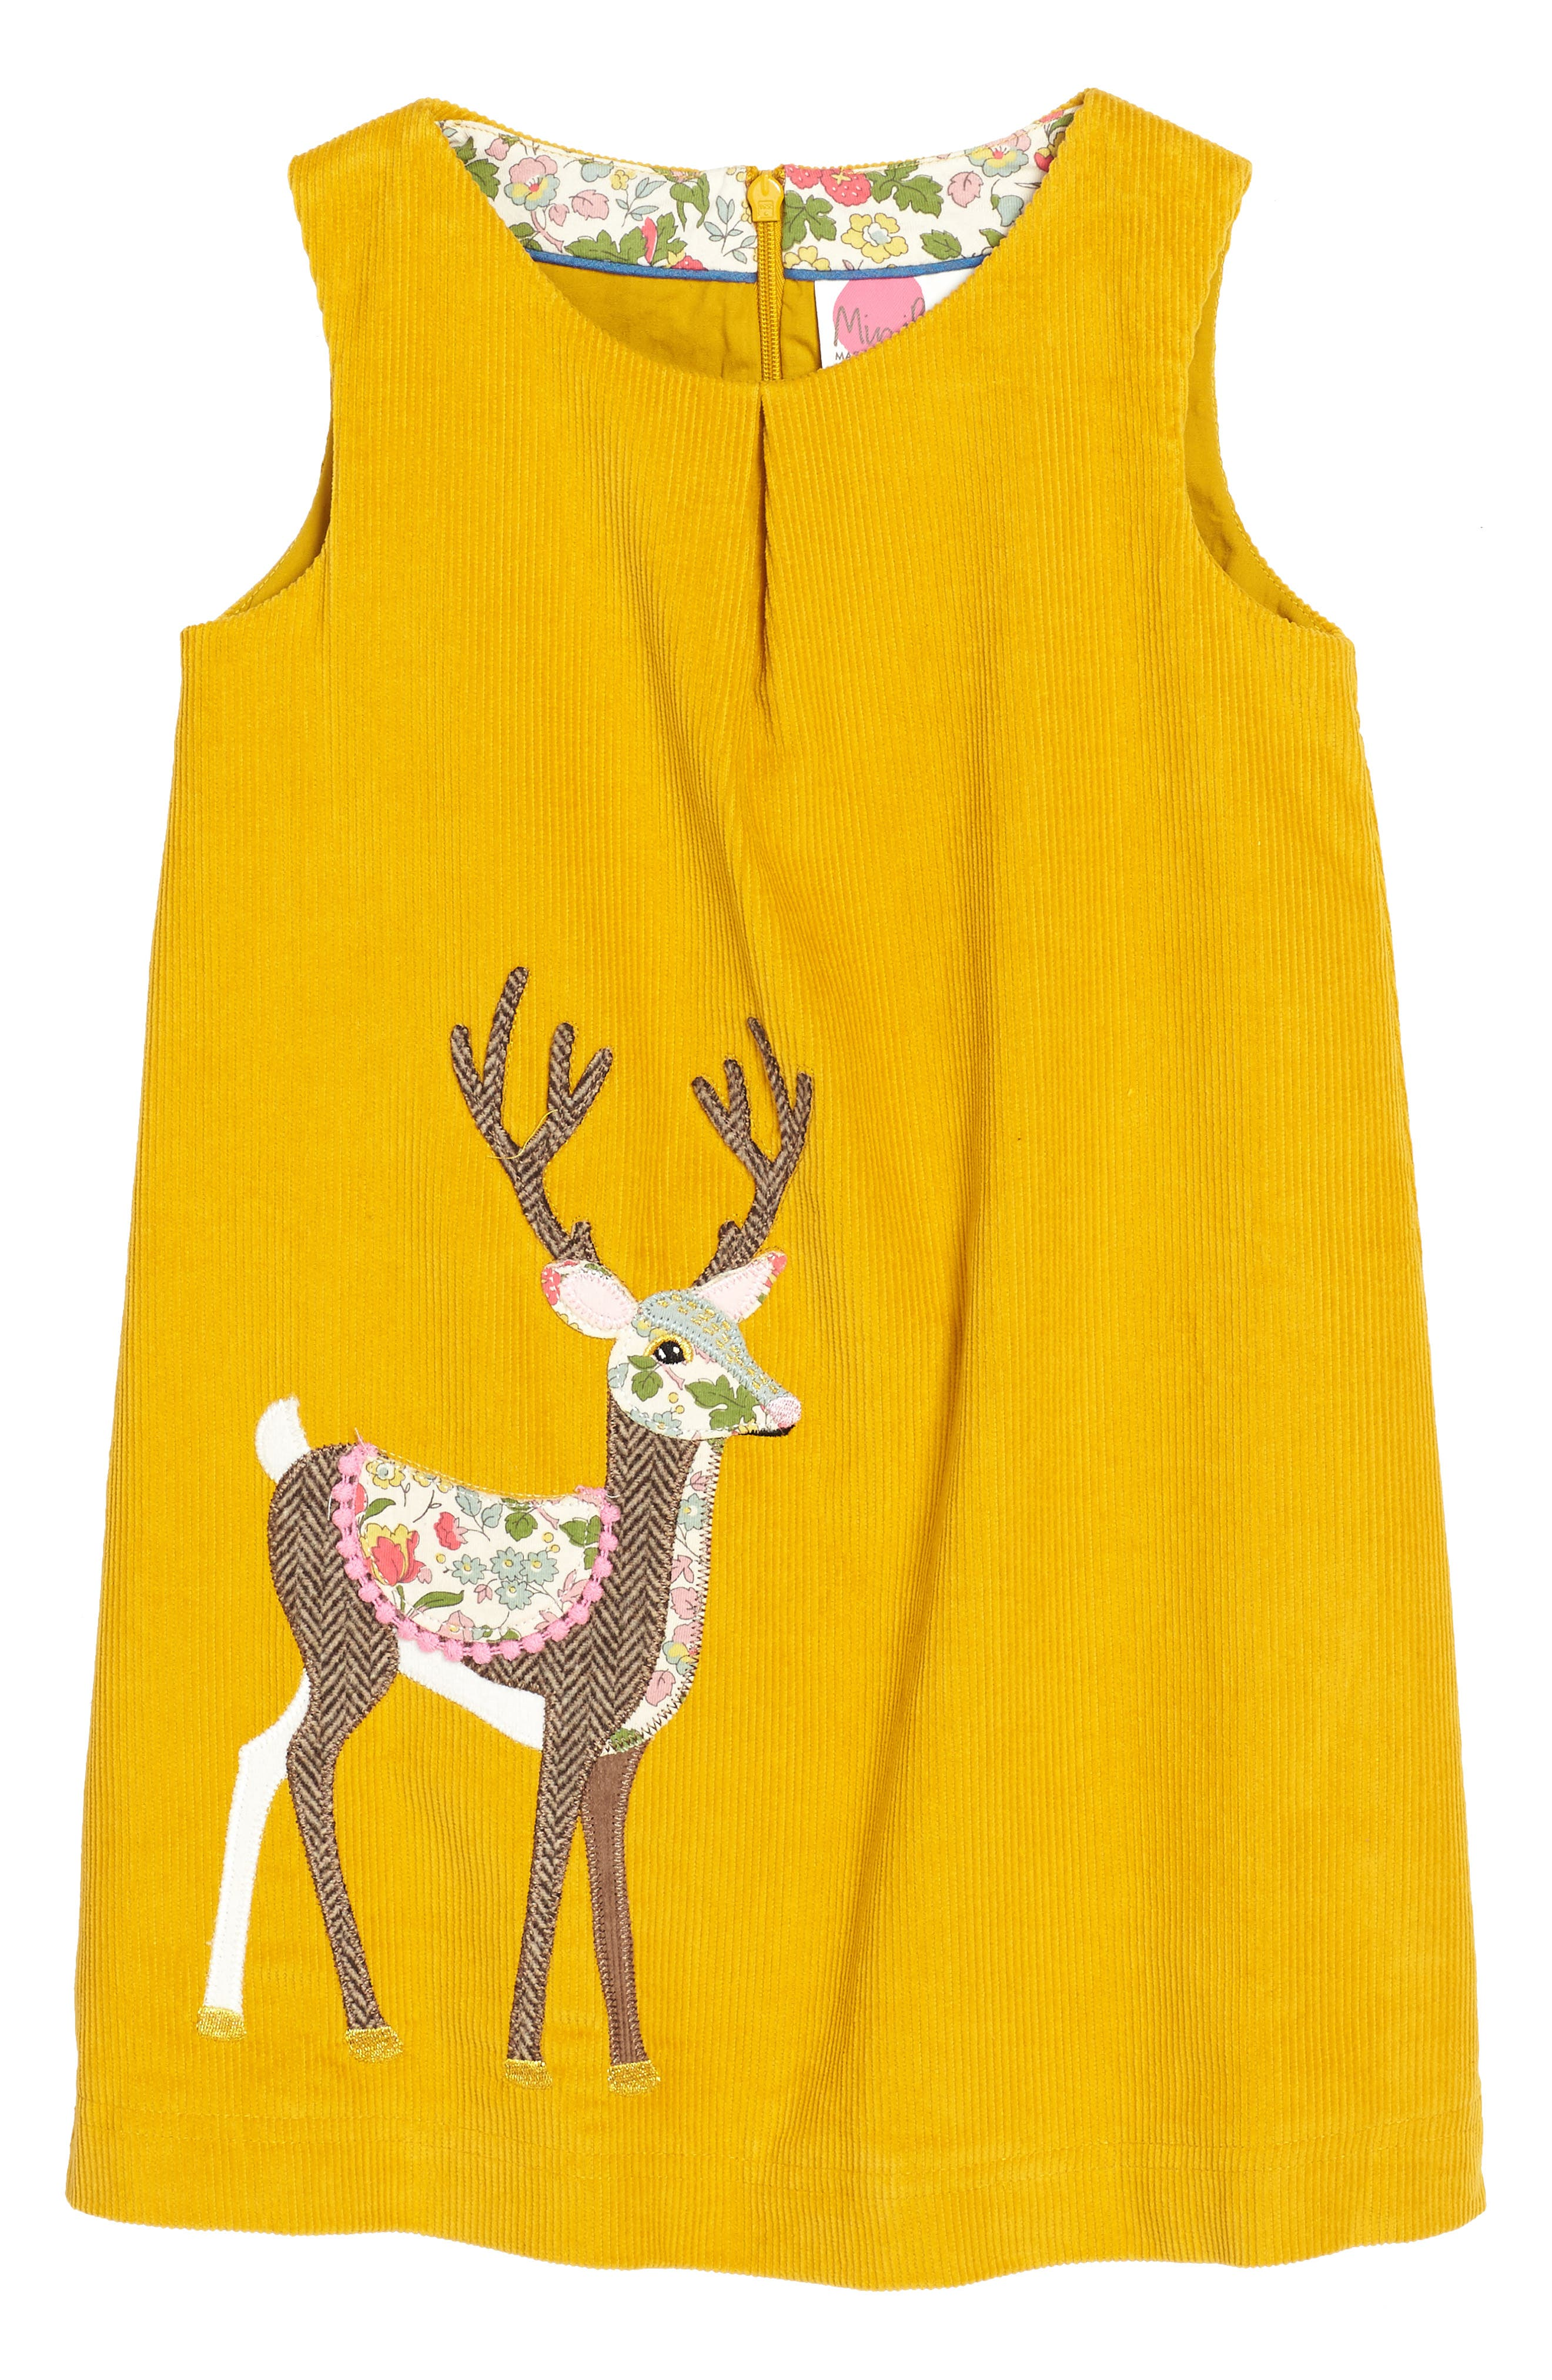 Animal Appliqué Dress,                             Main thumbnail 1, color,                             Saffron Yellow Deer Yel